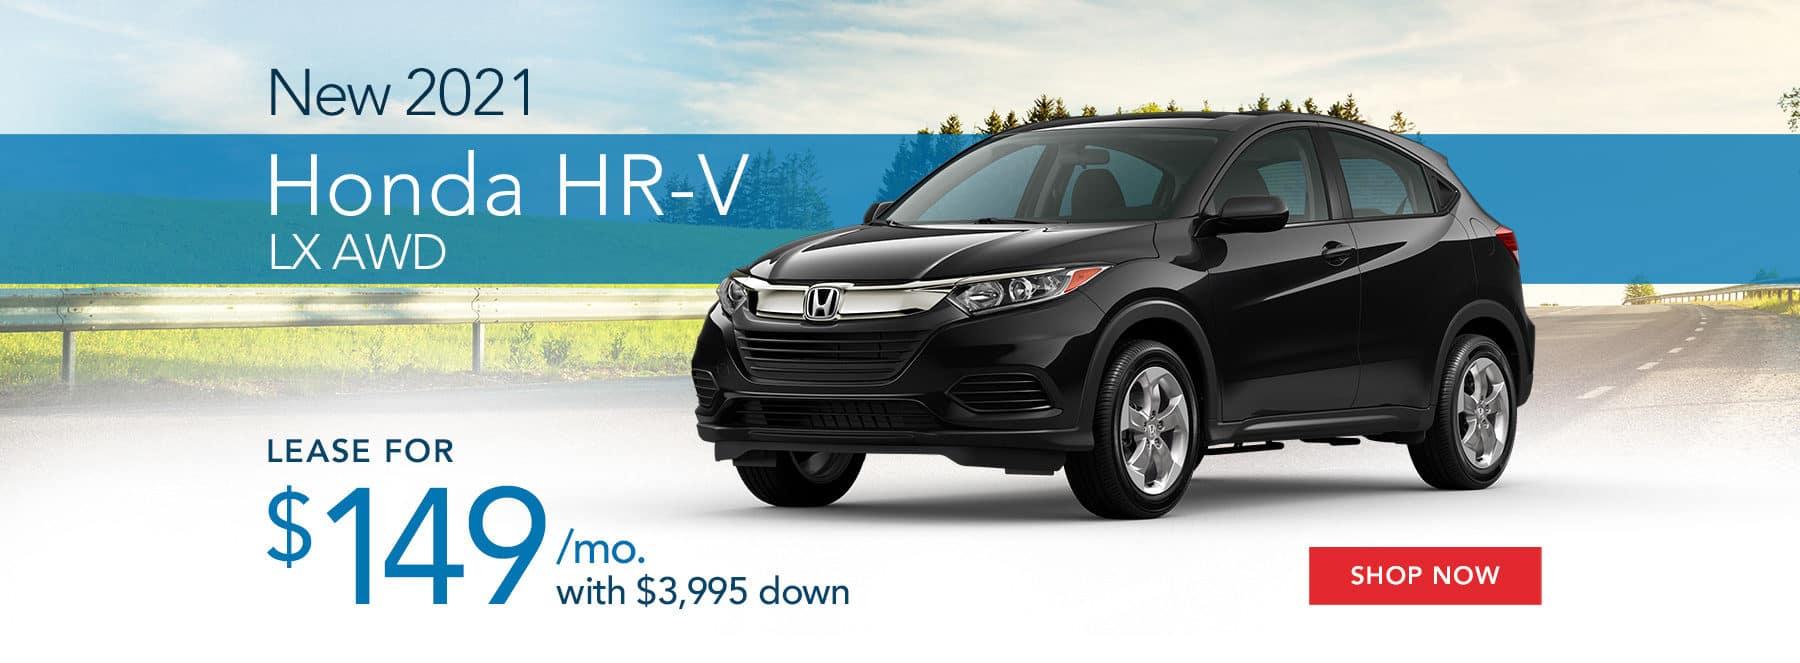 BHO_1800x663_New 2021 Honda HR-V LX AWD_06'21